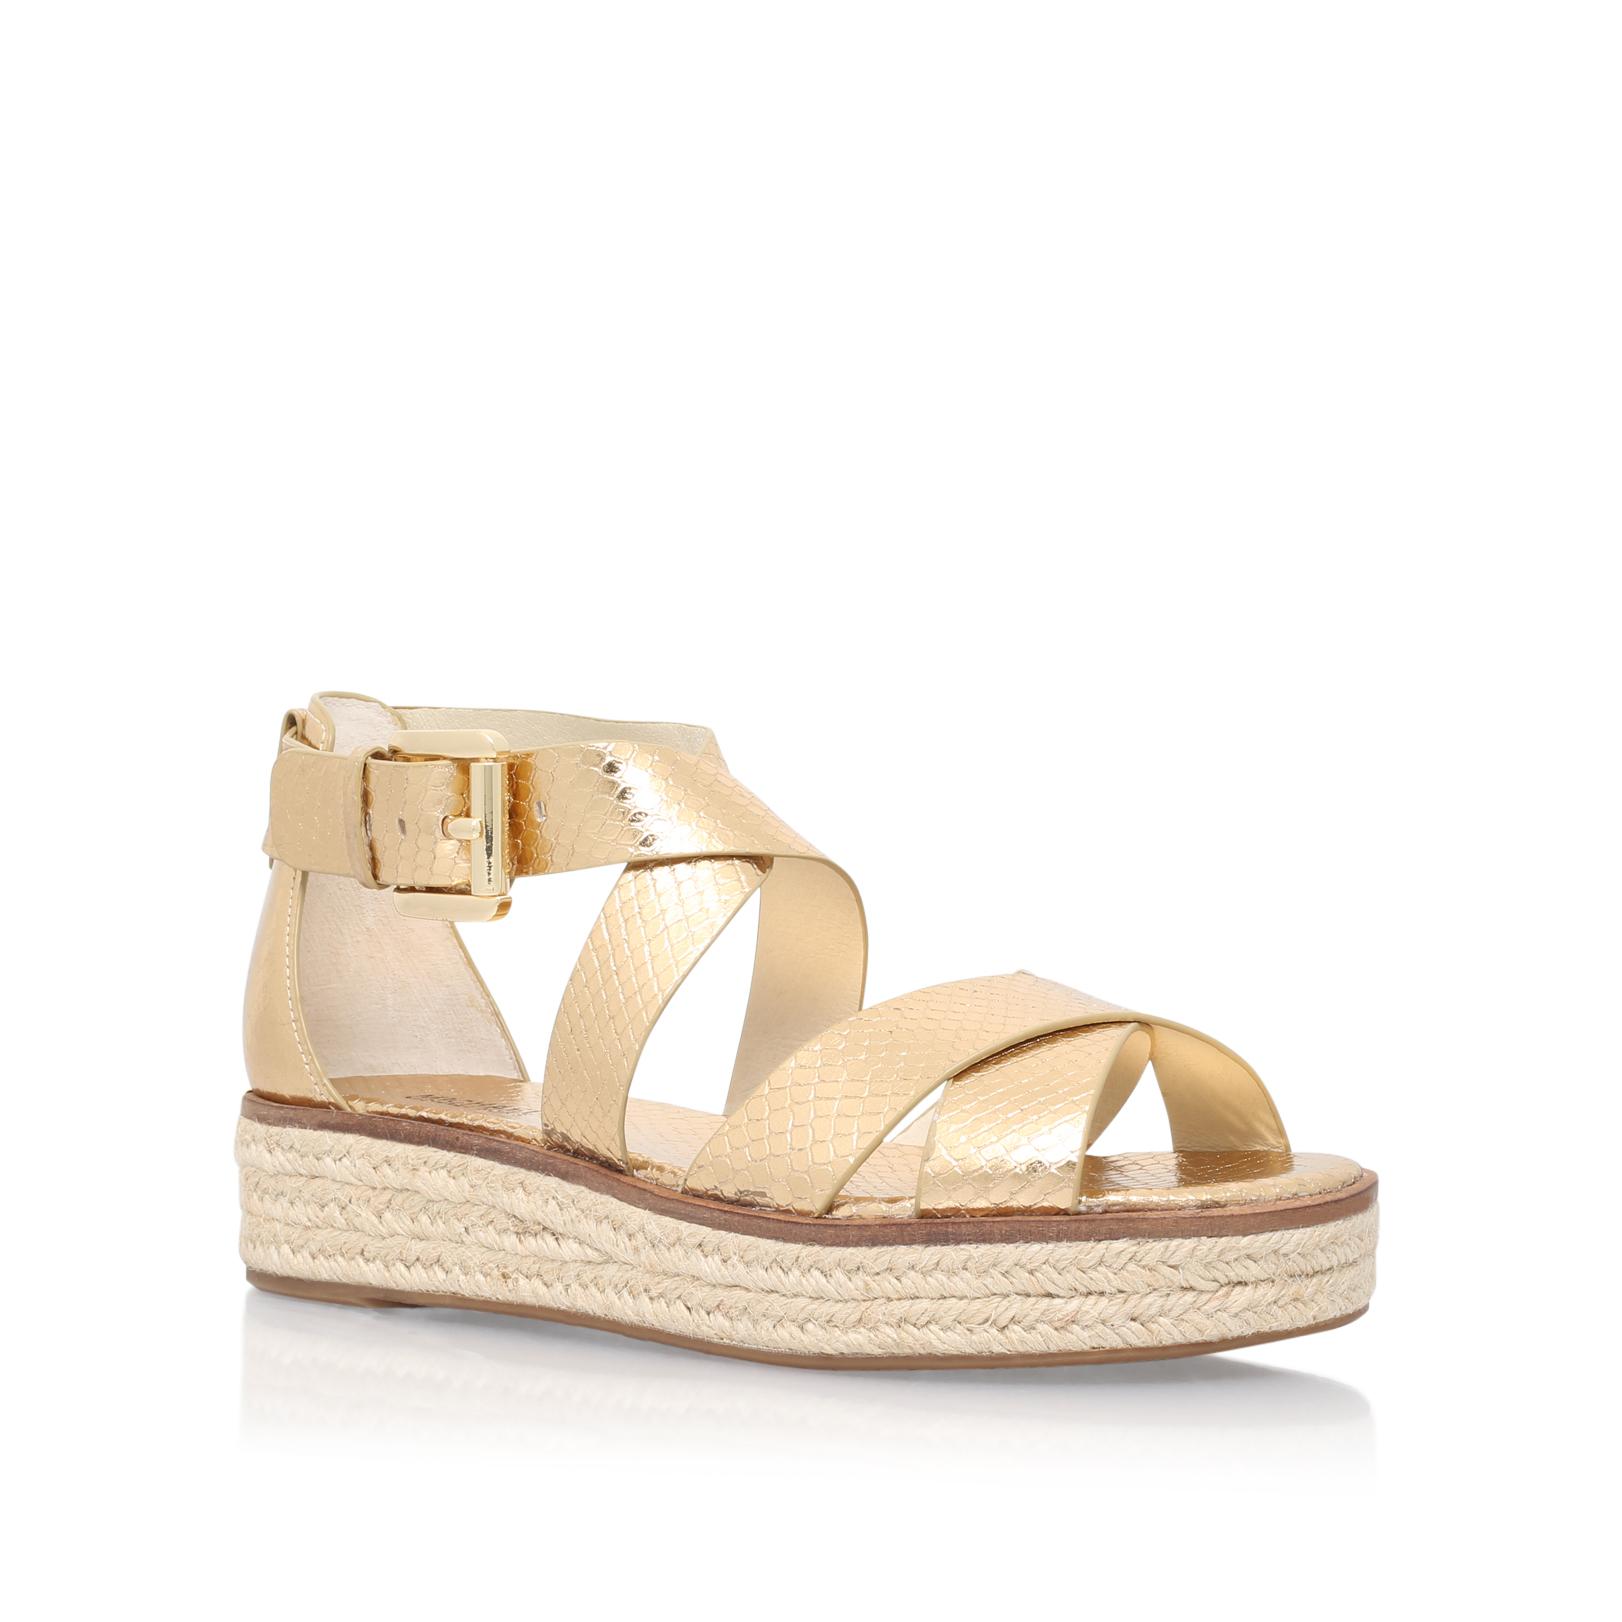 1bb7401558f DARBY SANDAL Michael Michael Kors Darby Sandal Gold Snake Print Flat Sandals  Flatform by MICHAEL MICHAEL KORS